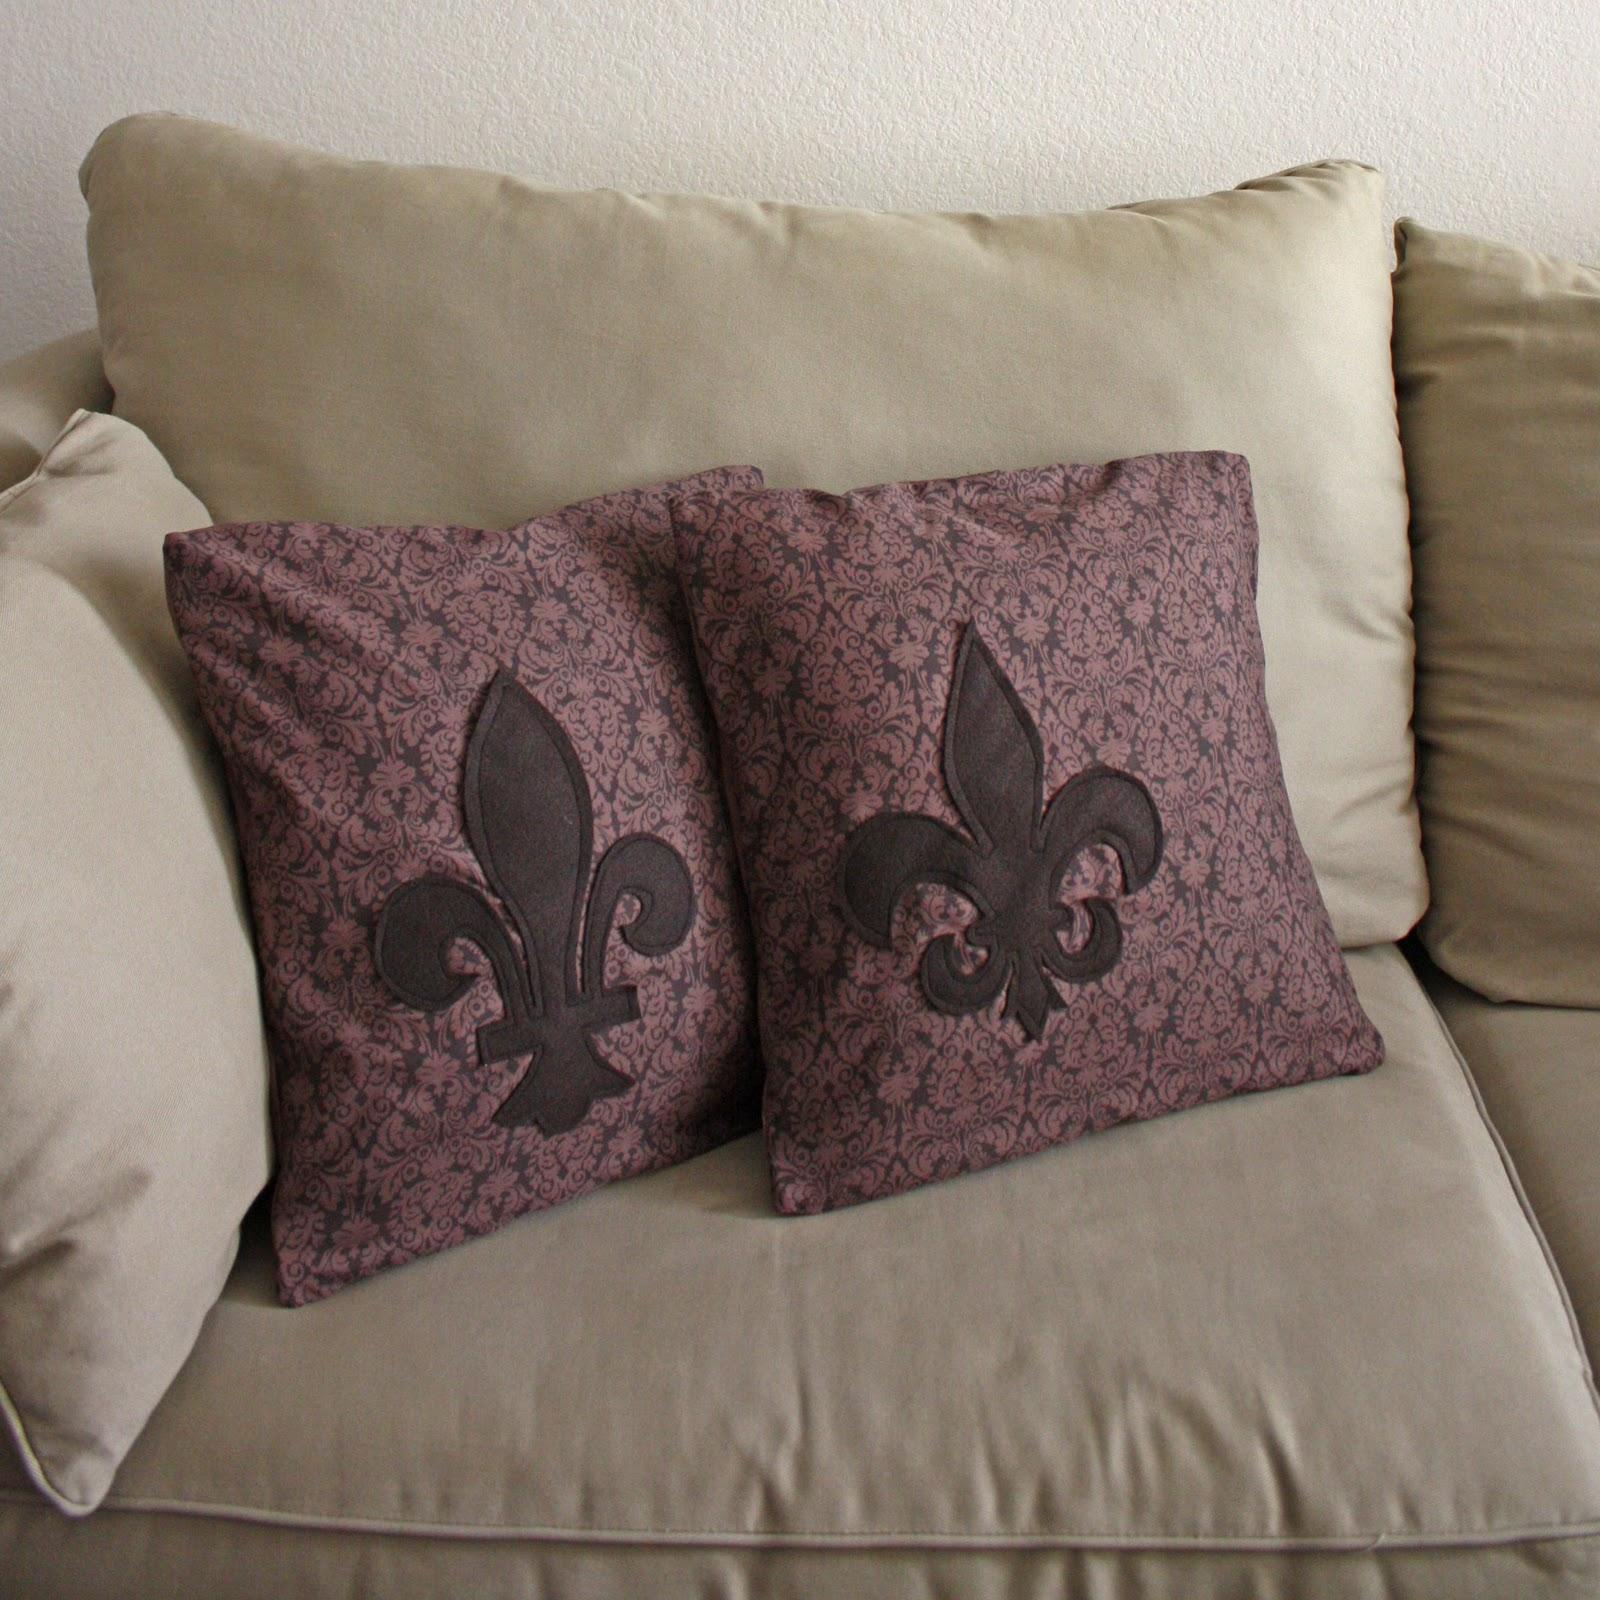 Felt Silhouette Pillows